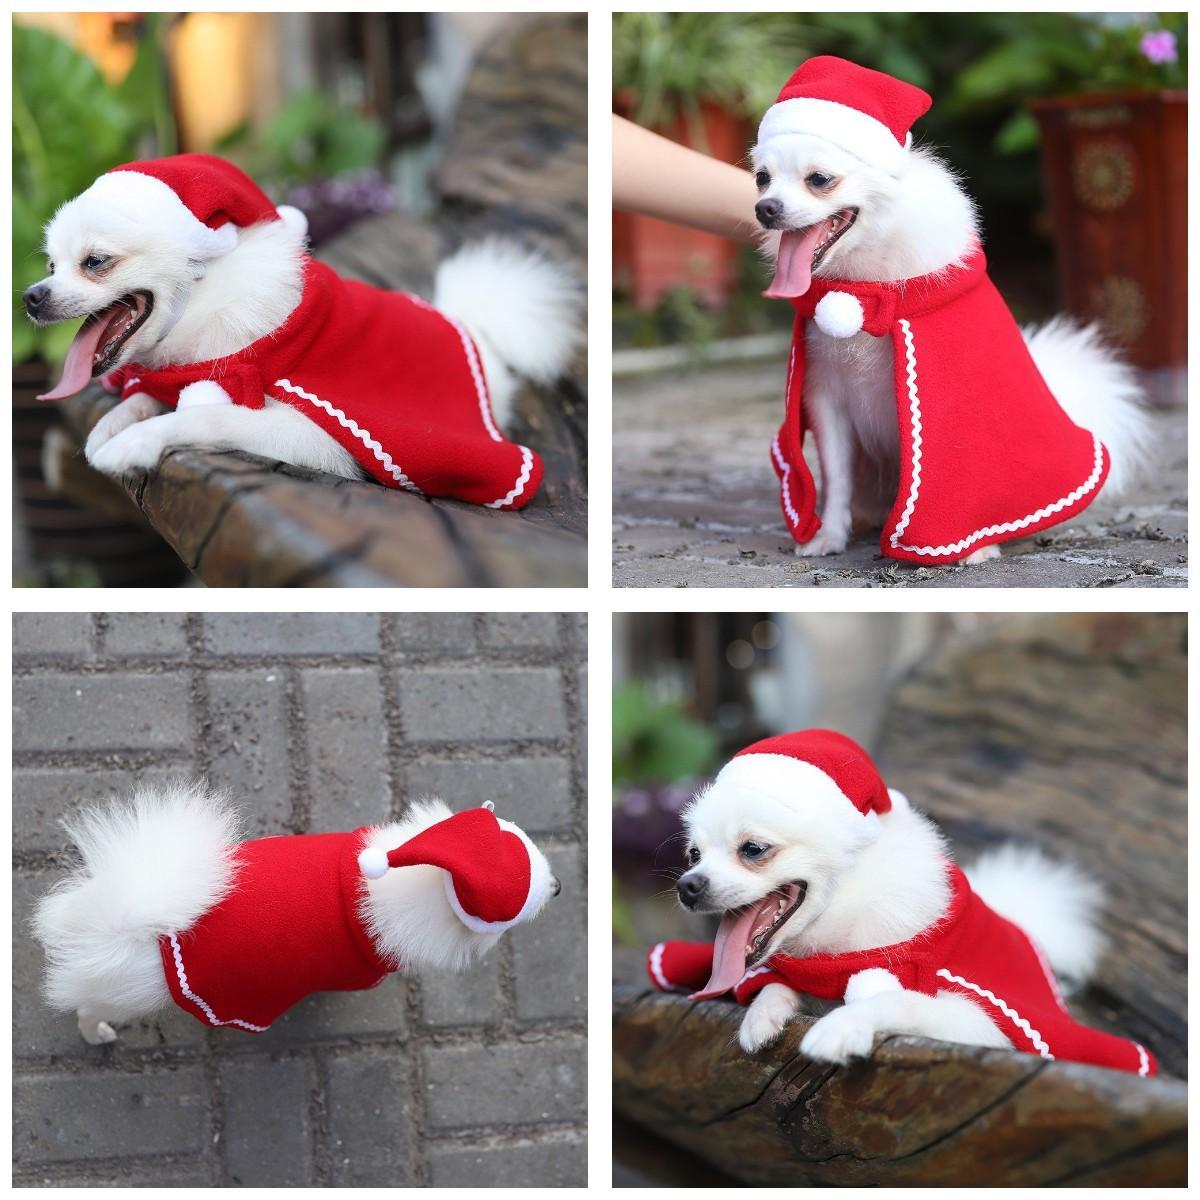 Christmas pet decoration small dog clothing clothing dress dog Teddy dog Cape HAT DRESS Christmas pet hat Cape suit T3I51106